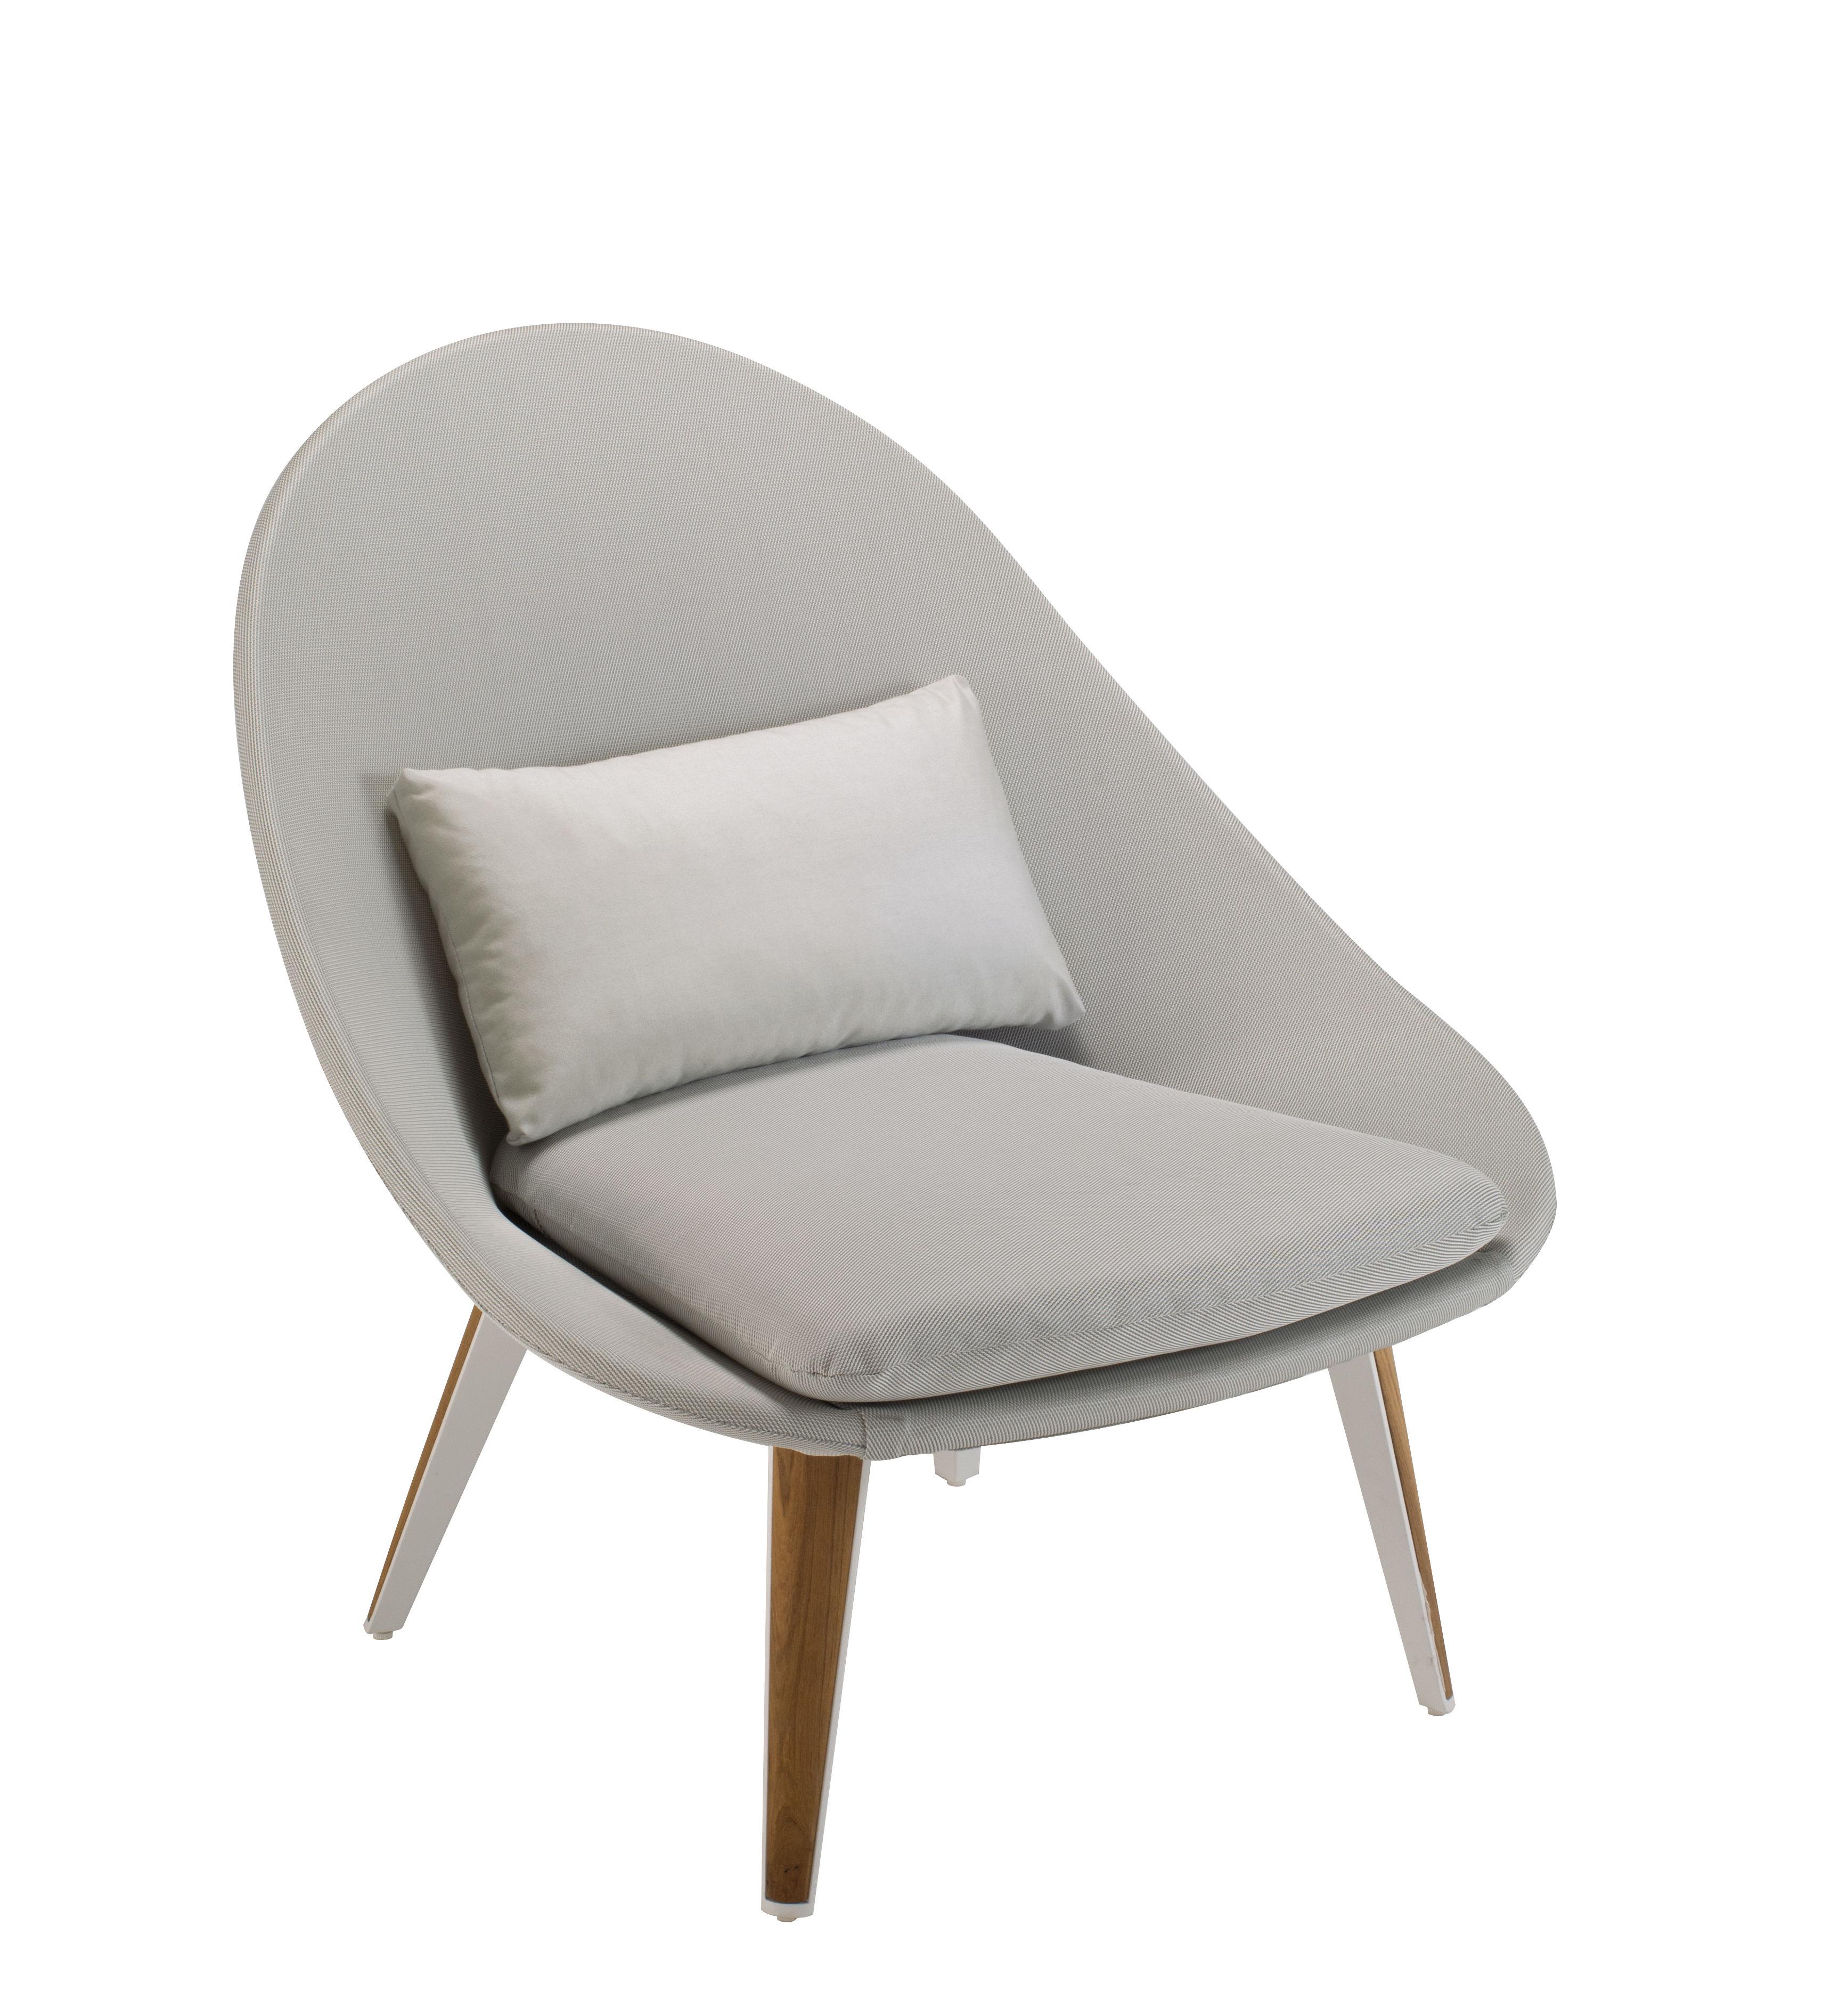 Furniture - Armchairs - Vanity Low armchair - Fabric & teak by Vlaemynck - Grey / White & teak - Lacquered aluminium, Polyurethane foam, Sling canvas, Teak